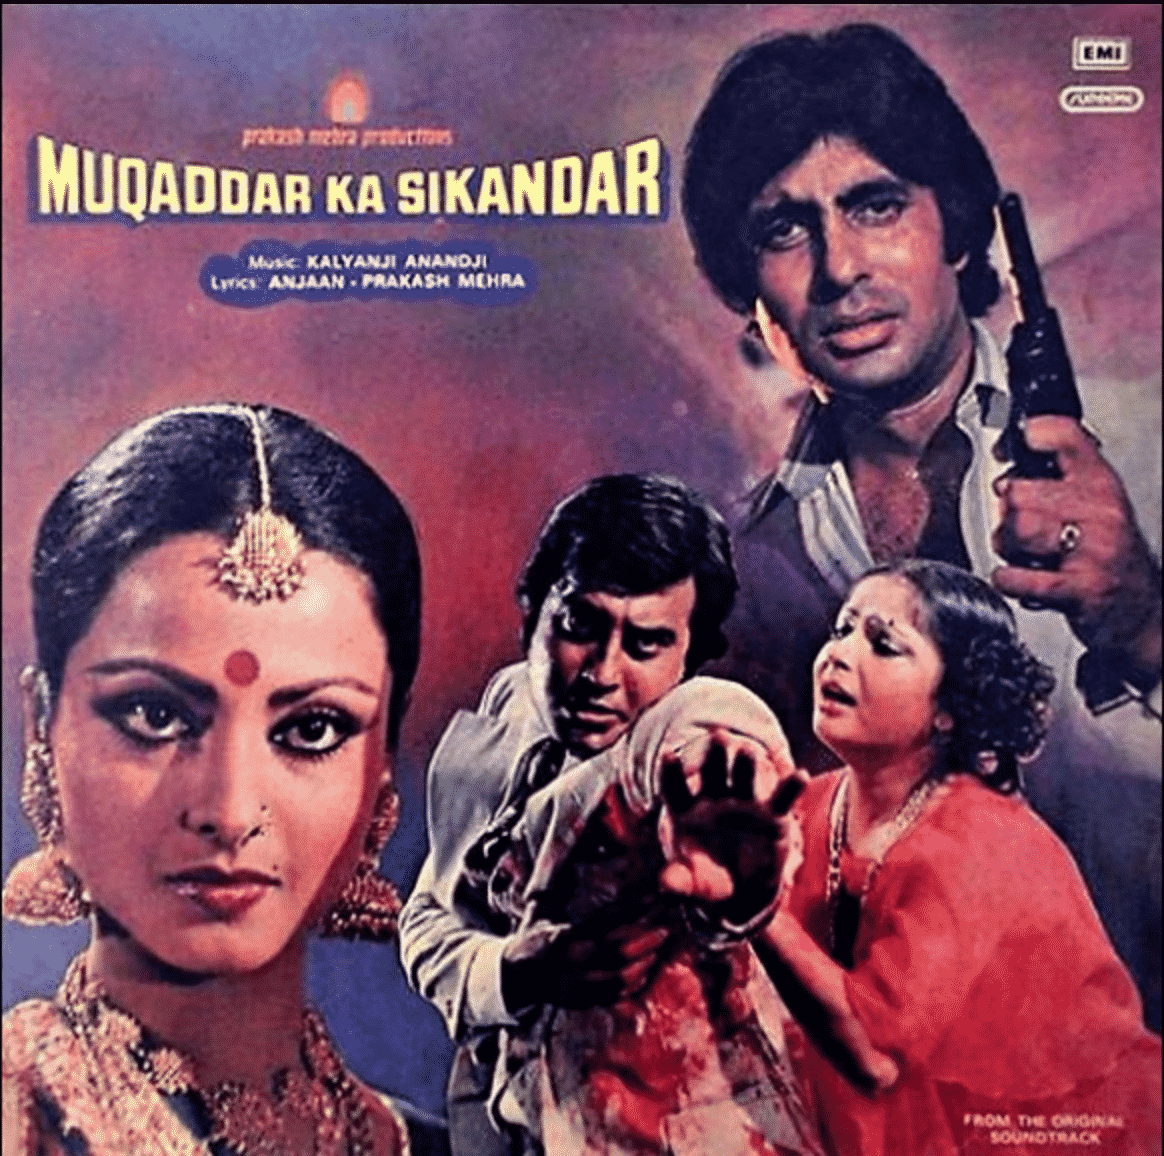 Muqaddar Ka Sikandar: Underrated Amitabh Bachchan-starrer is the quintessential '70s Hindi film 3